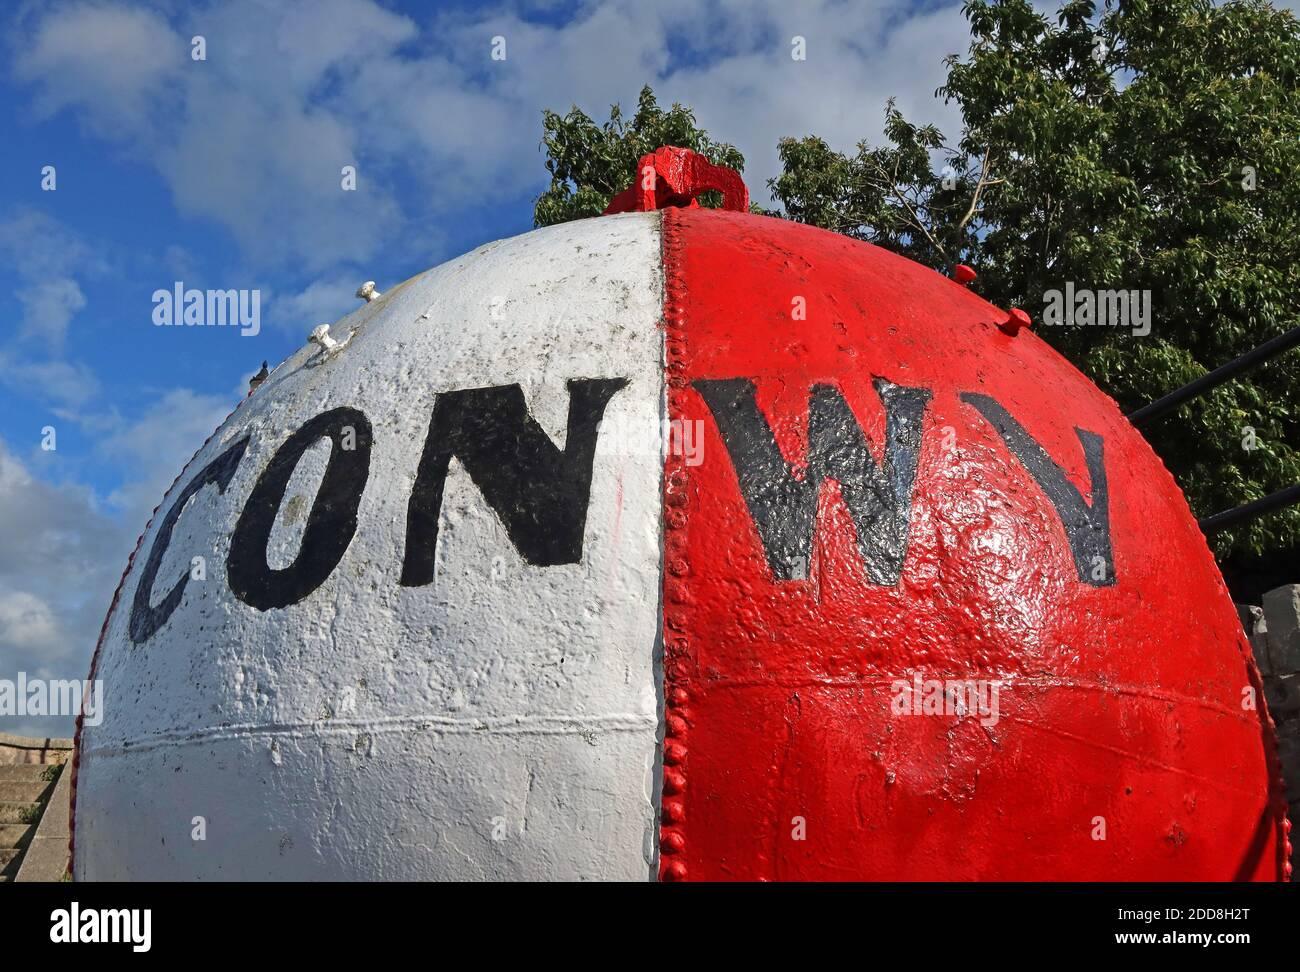 GoTonySmith,Hotpixuk,@Hotpixuk,North Wales,Wales,Welsh,coast,coastal,town,LL32,Gwynedd,Conway,Con,Wy,Way,UK,maritime